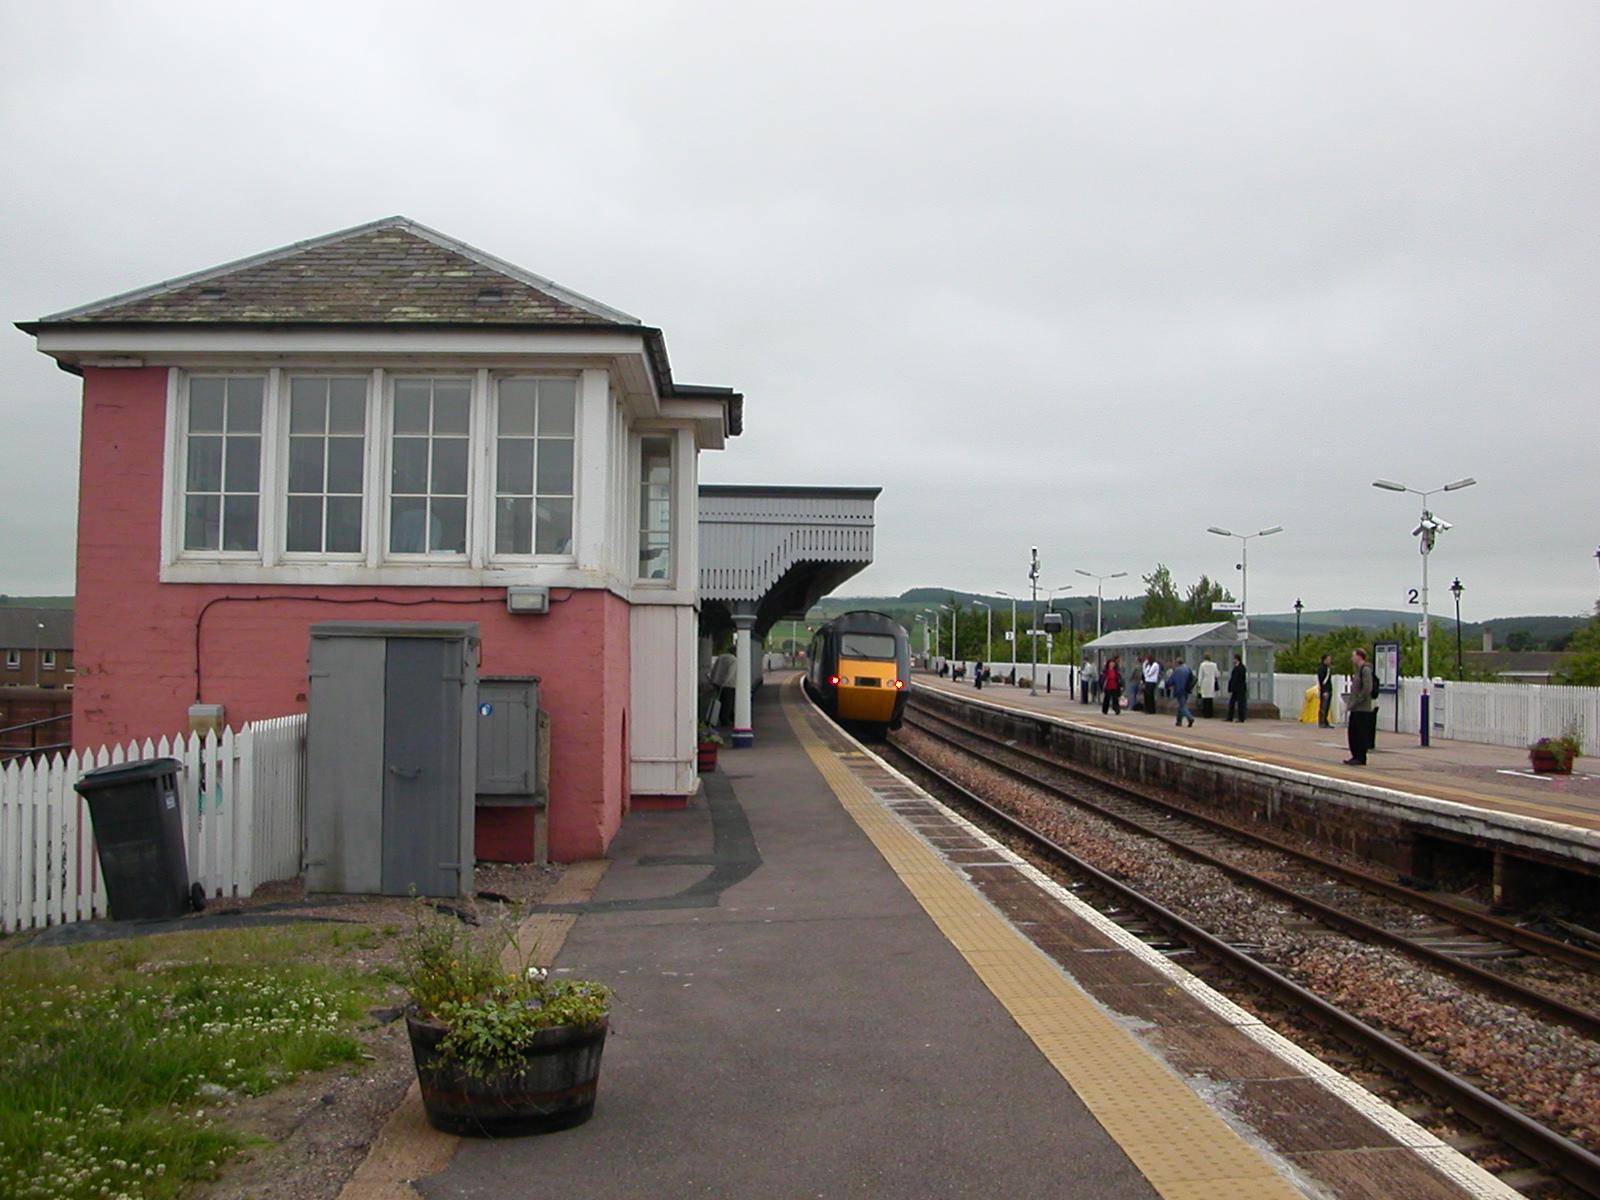 https://upload.wikimedia.org/wikipedia/commons/2/24/Stonehaven_Railway_Station_03.JPG